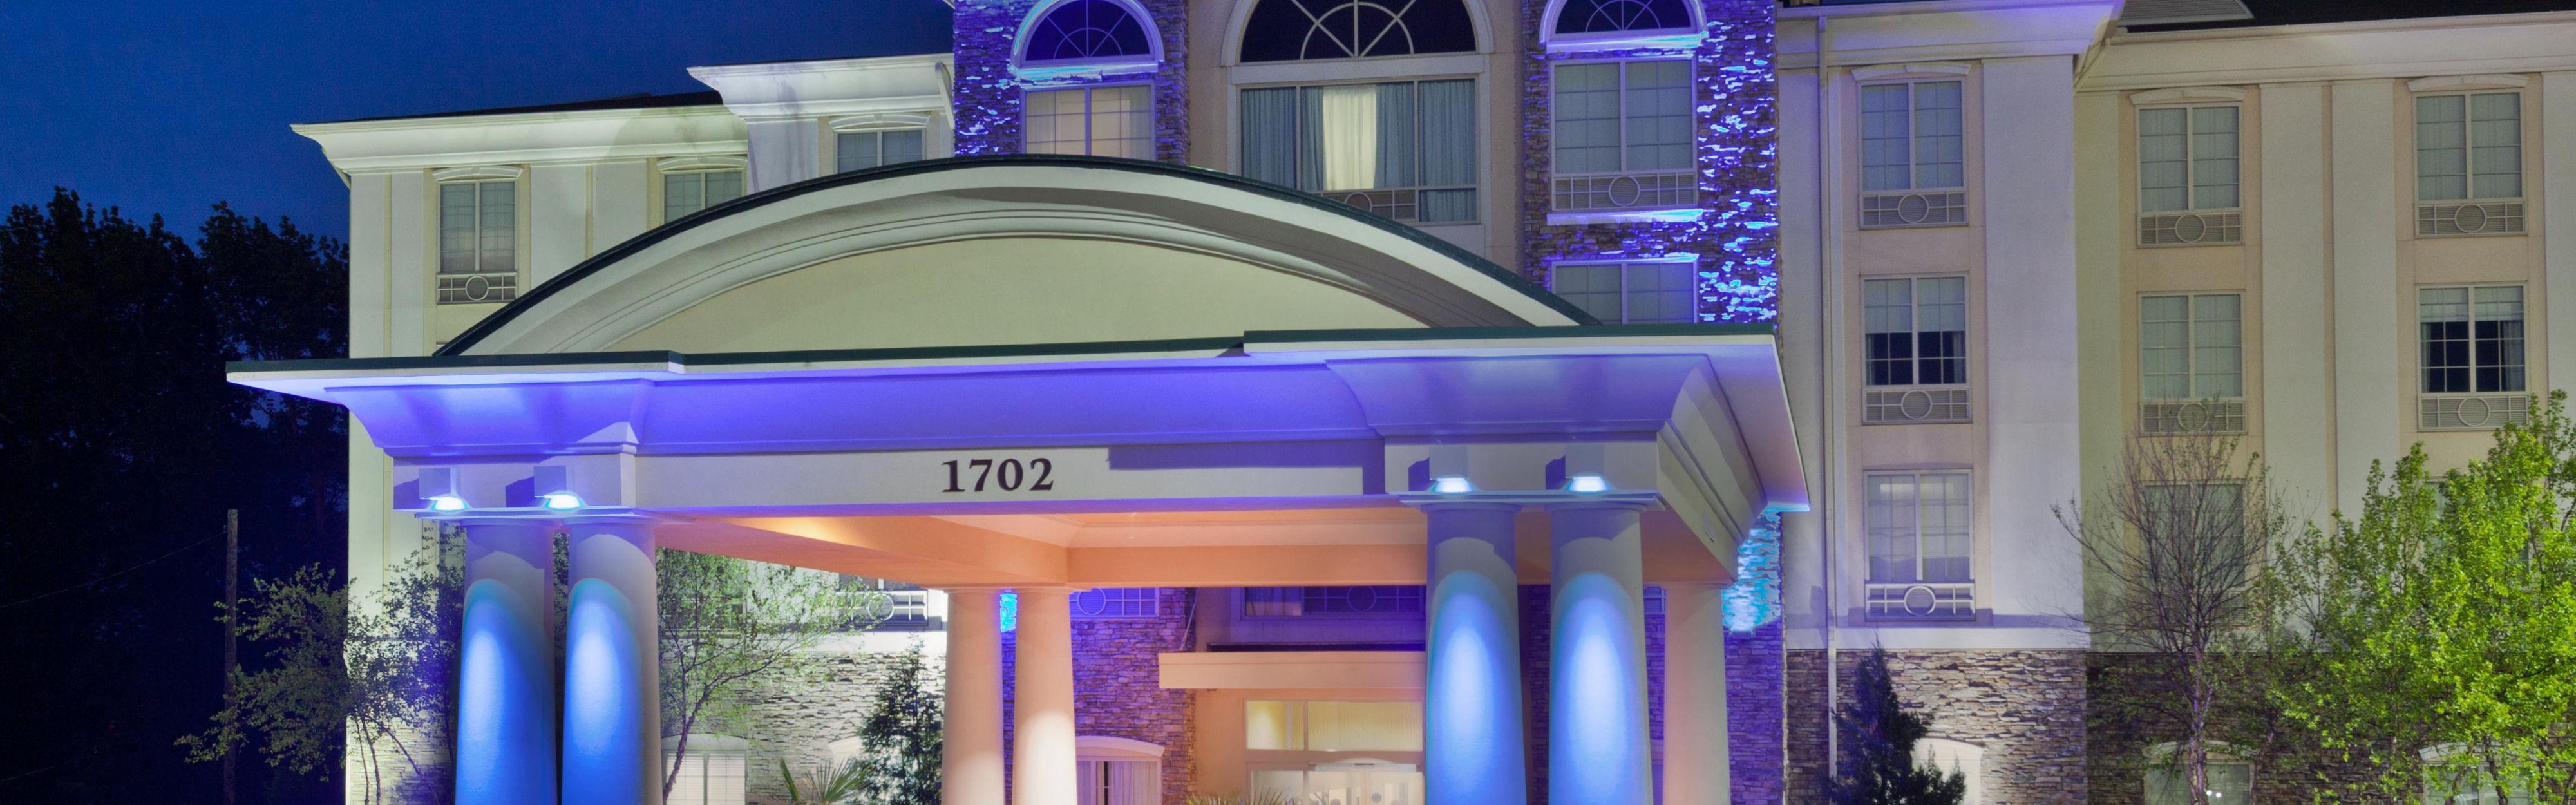 Holiday Inn Express Phenix City-Ft.Benning Area image 0